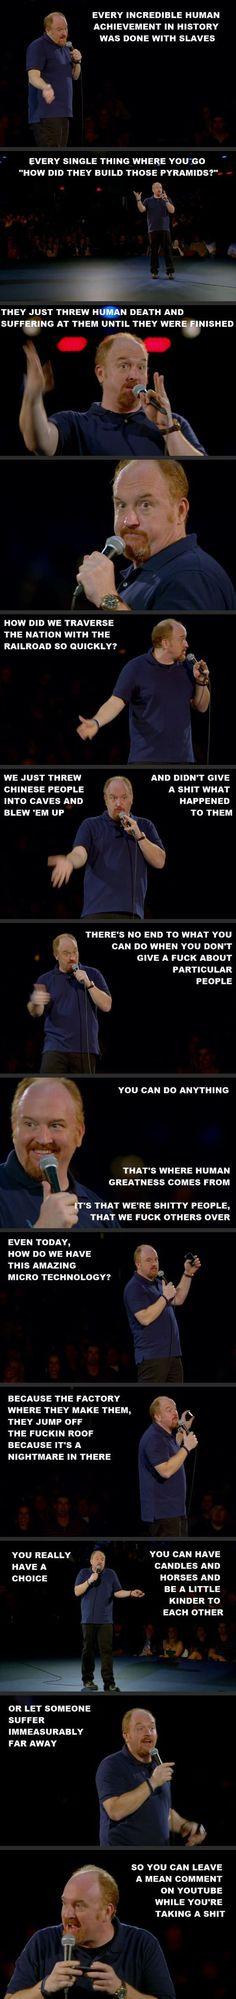 Louie Louie Louie yeeeeeeh  comedy smart right here.